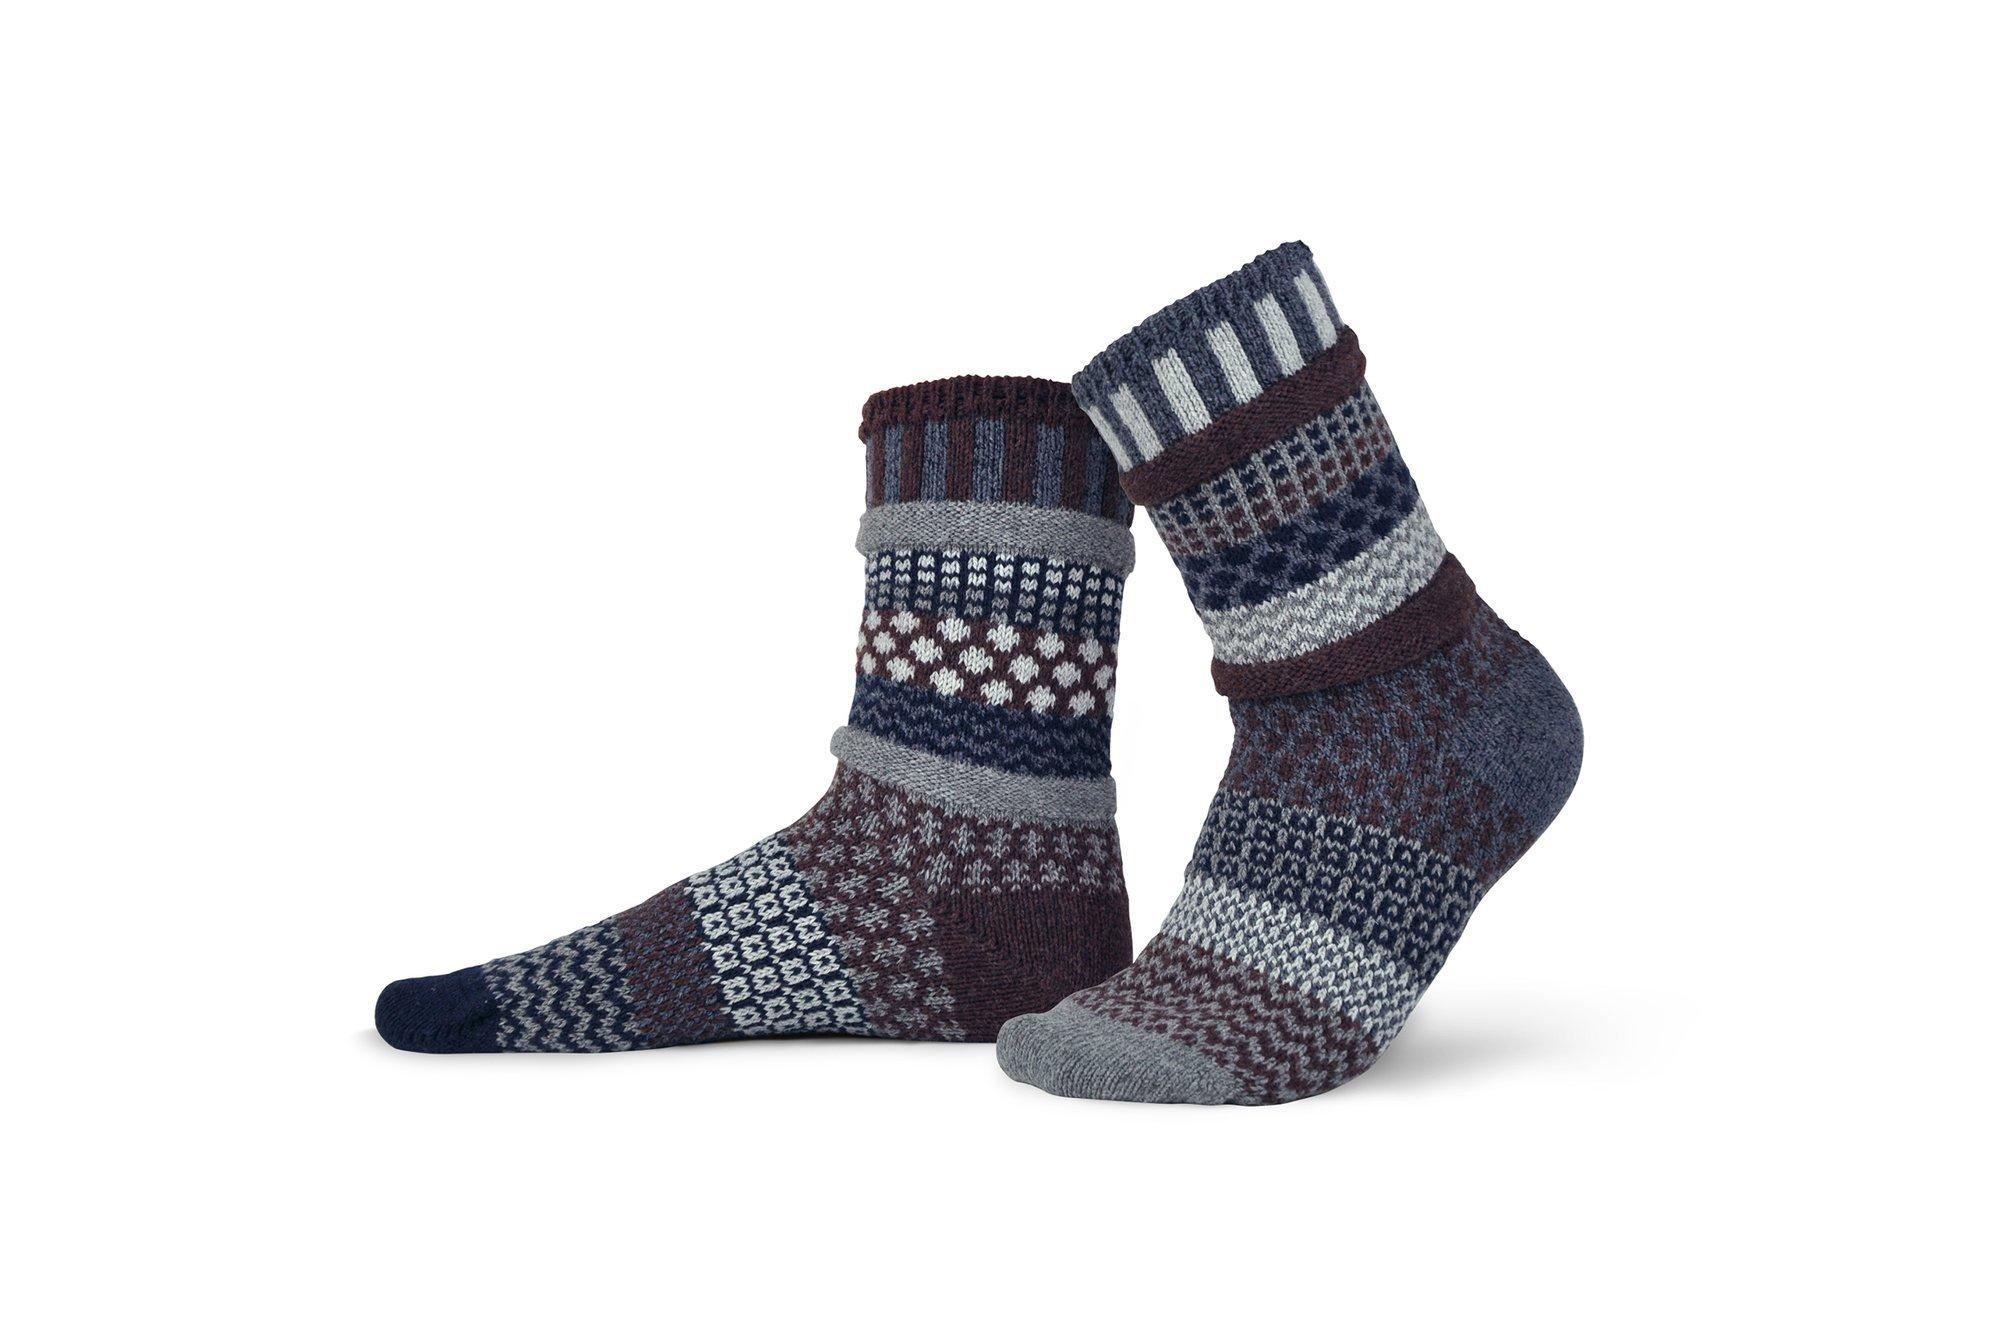 Solmate Wool Crew Socks Mahogany